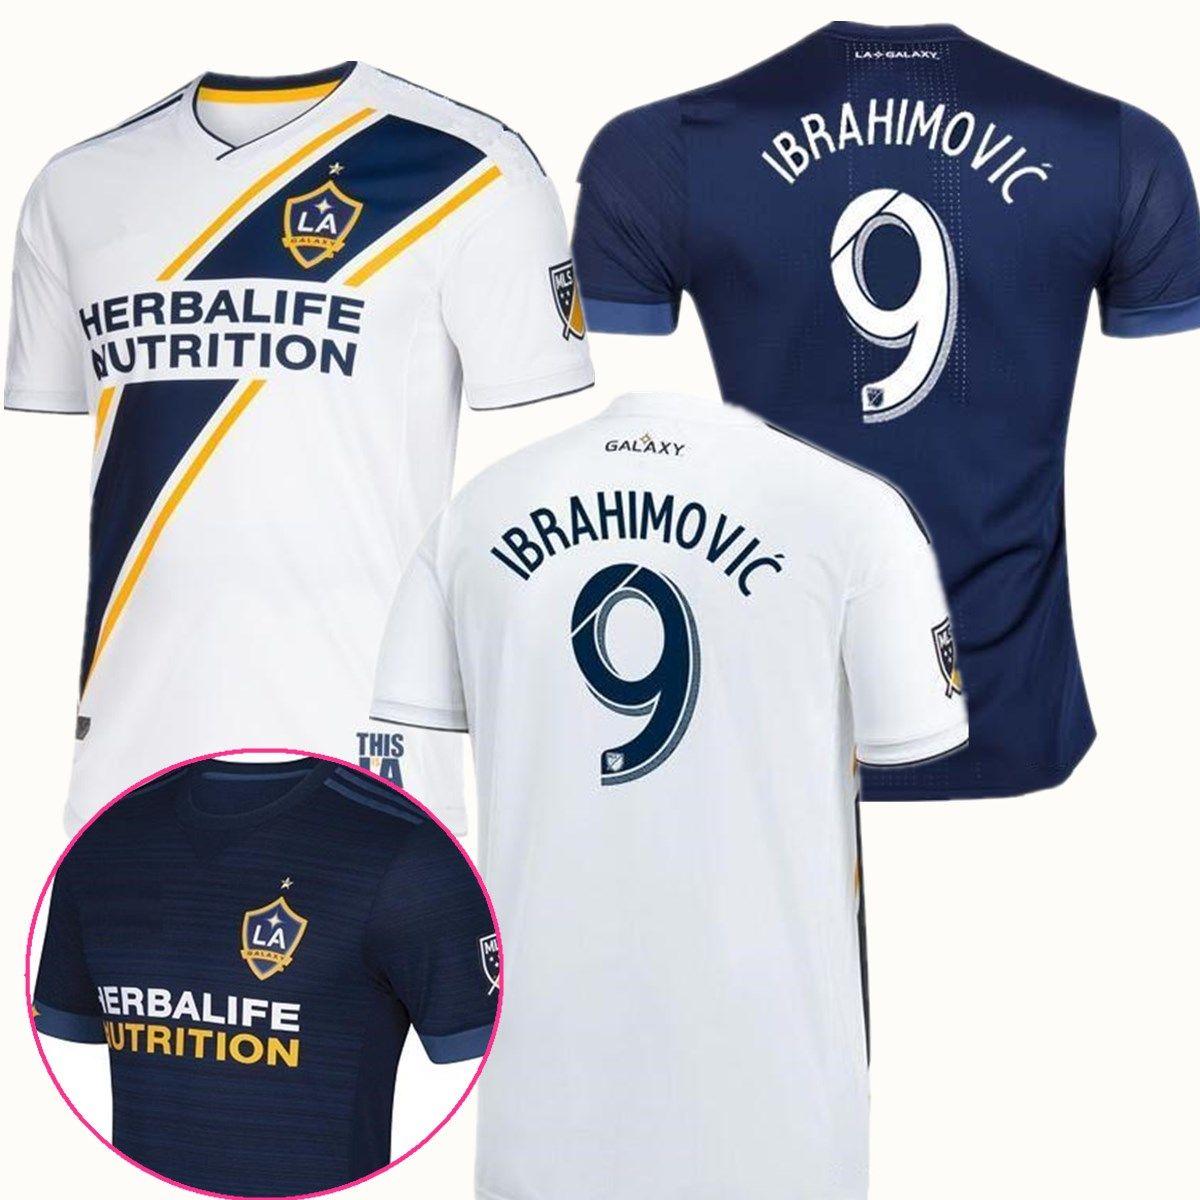 2018 2019 LA Galaxy Camisetas De Fútbol 18 19 GERRARD BECKHAM GIOVANI  ZARDES KEANE 9 Zlantan Ibrahimovic Camisetas De Fútbol Los Angeles Camiseta  Por ... c40225e823b0f